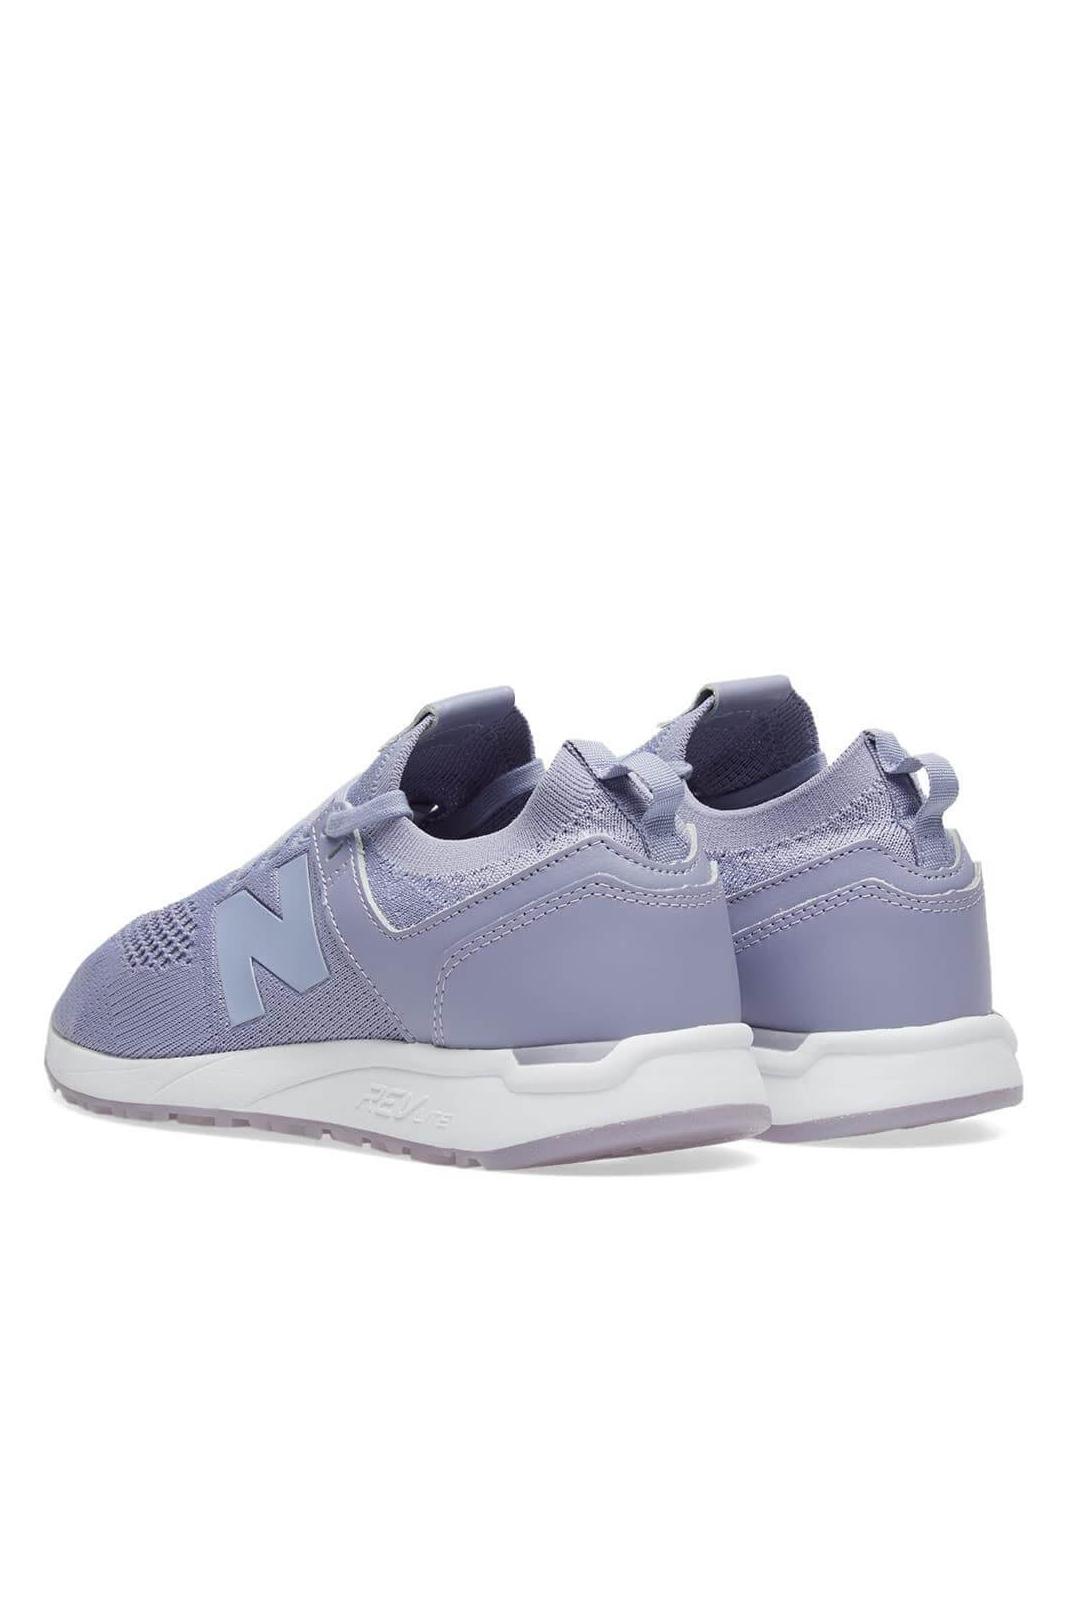 Chaussures  New balance WRL247SS LAVANDE